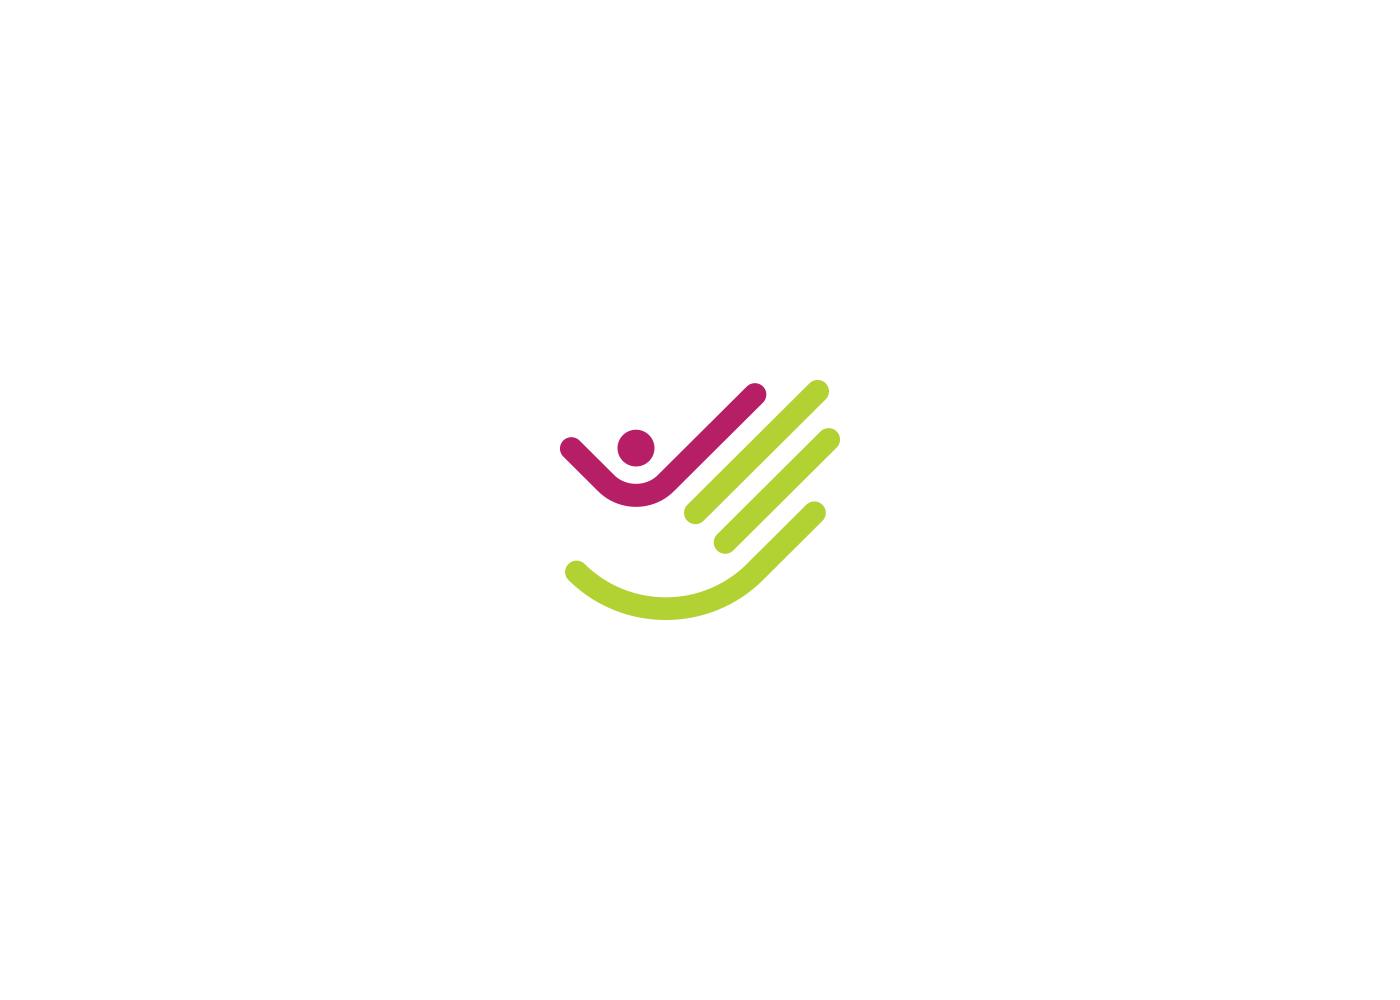 logo_design_bespaarlinq